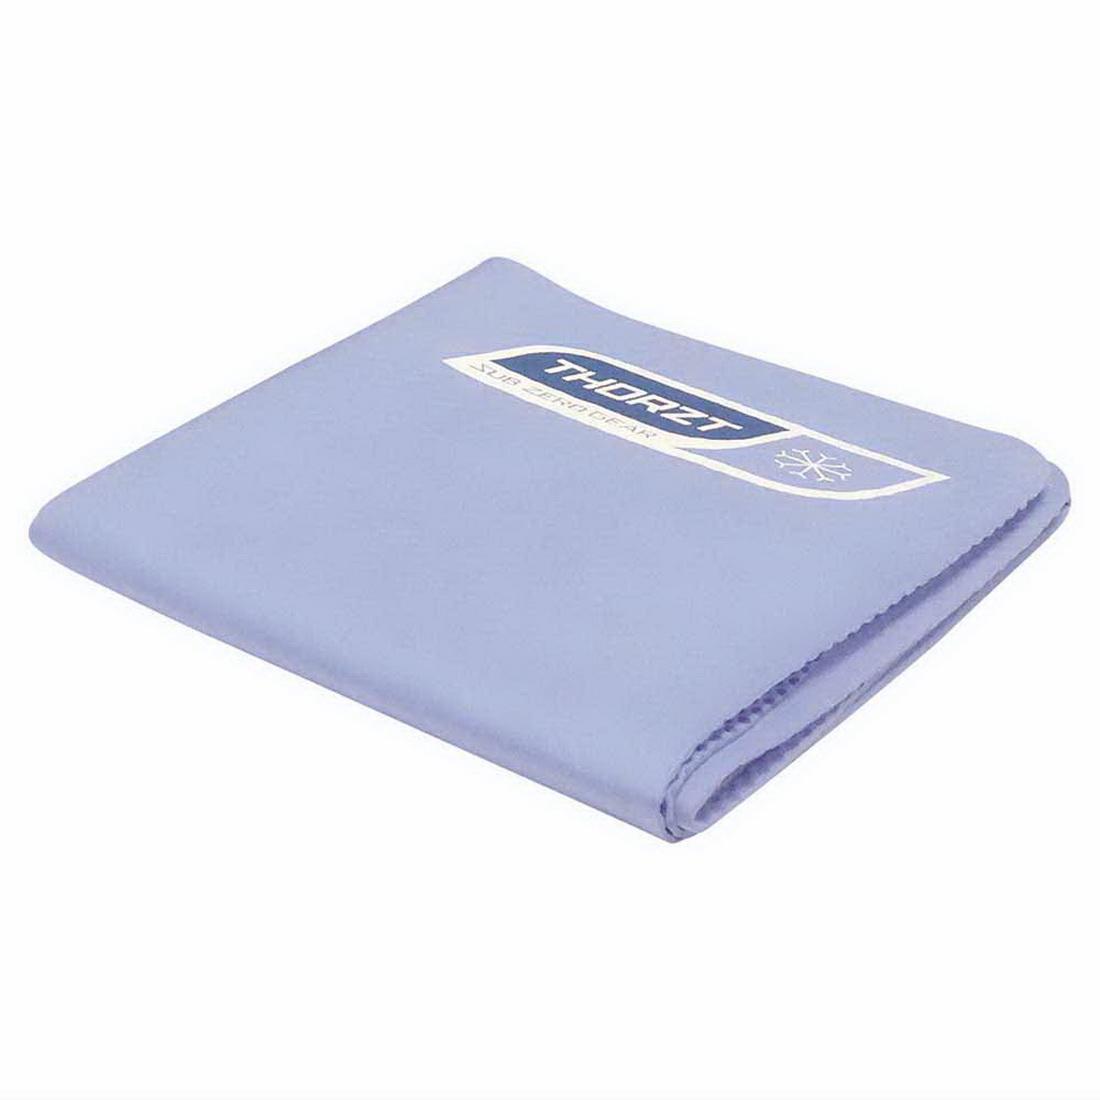 75x32cm Chill Towel Blue